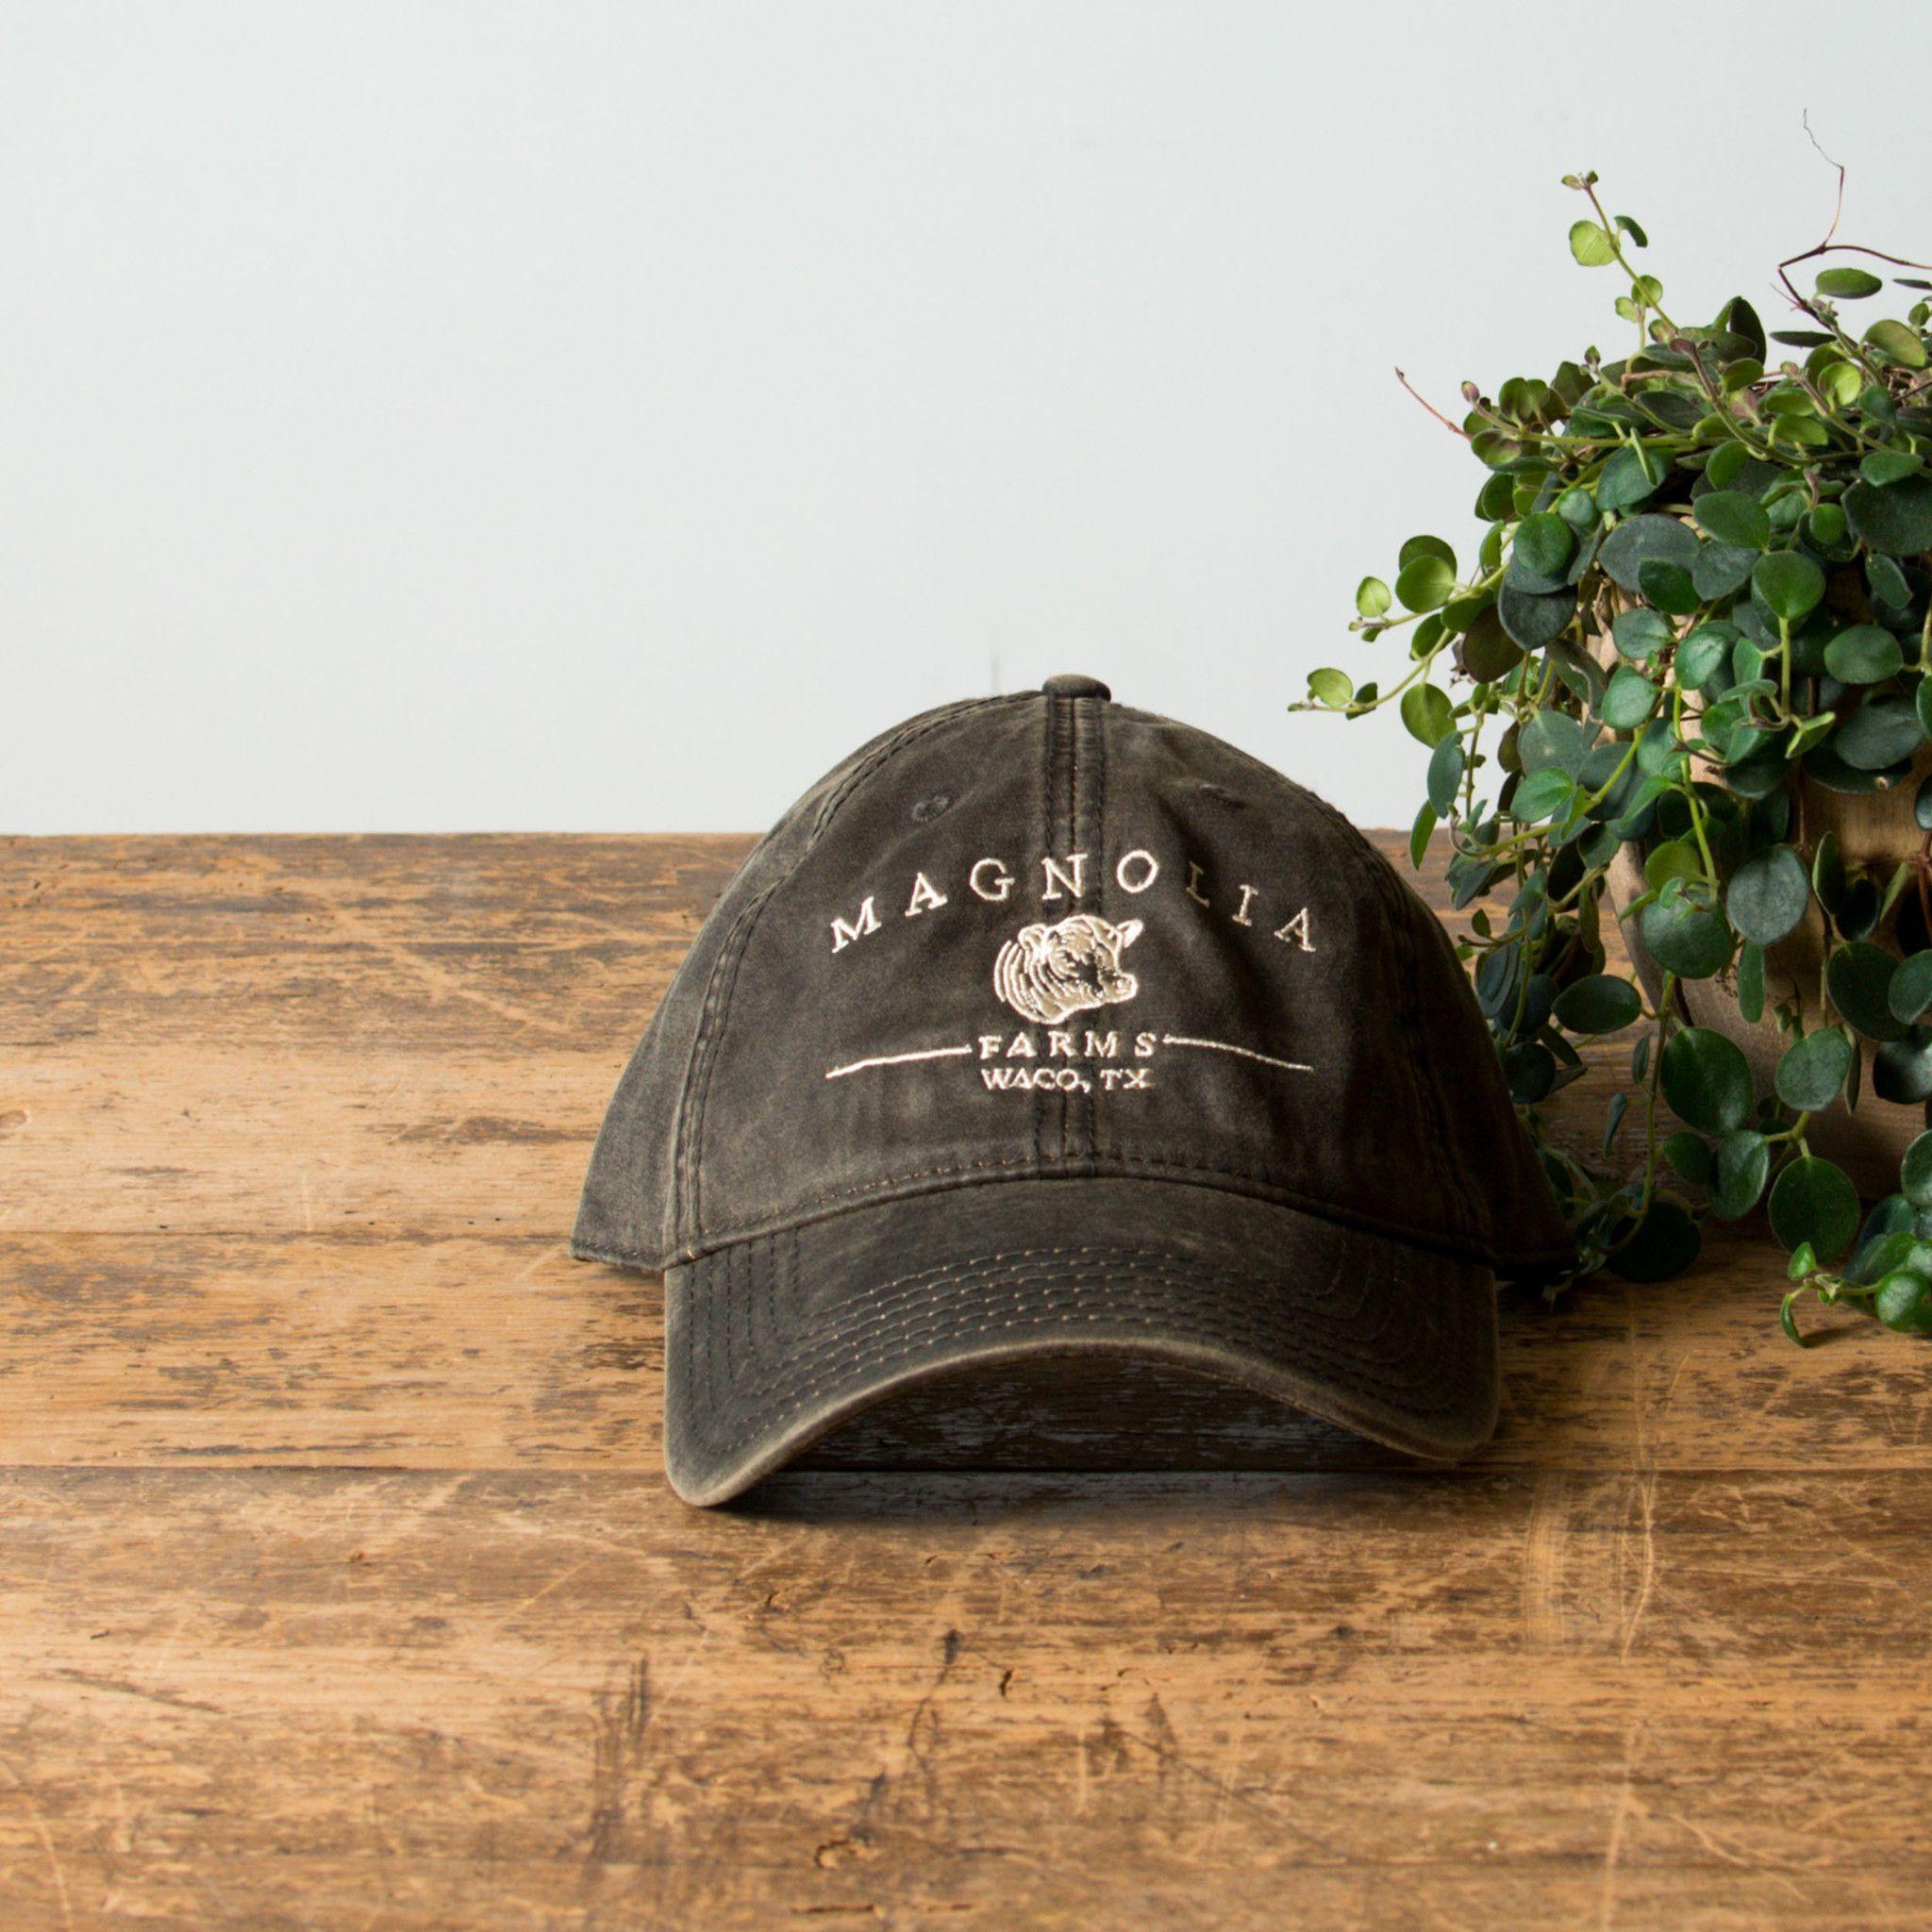 f083d760 Magnolia Farms Hat in 2019 | Apparel for Meh | Magnolia farms, Hats ...